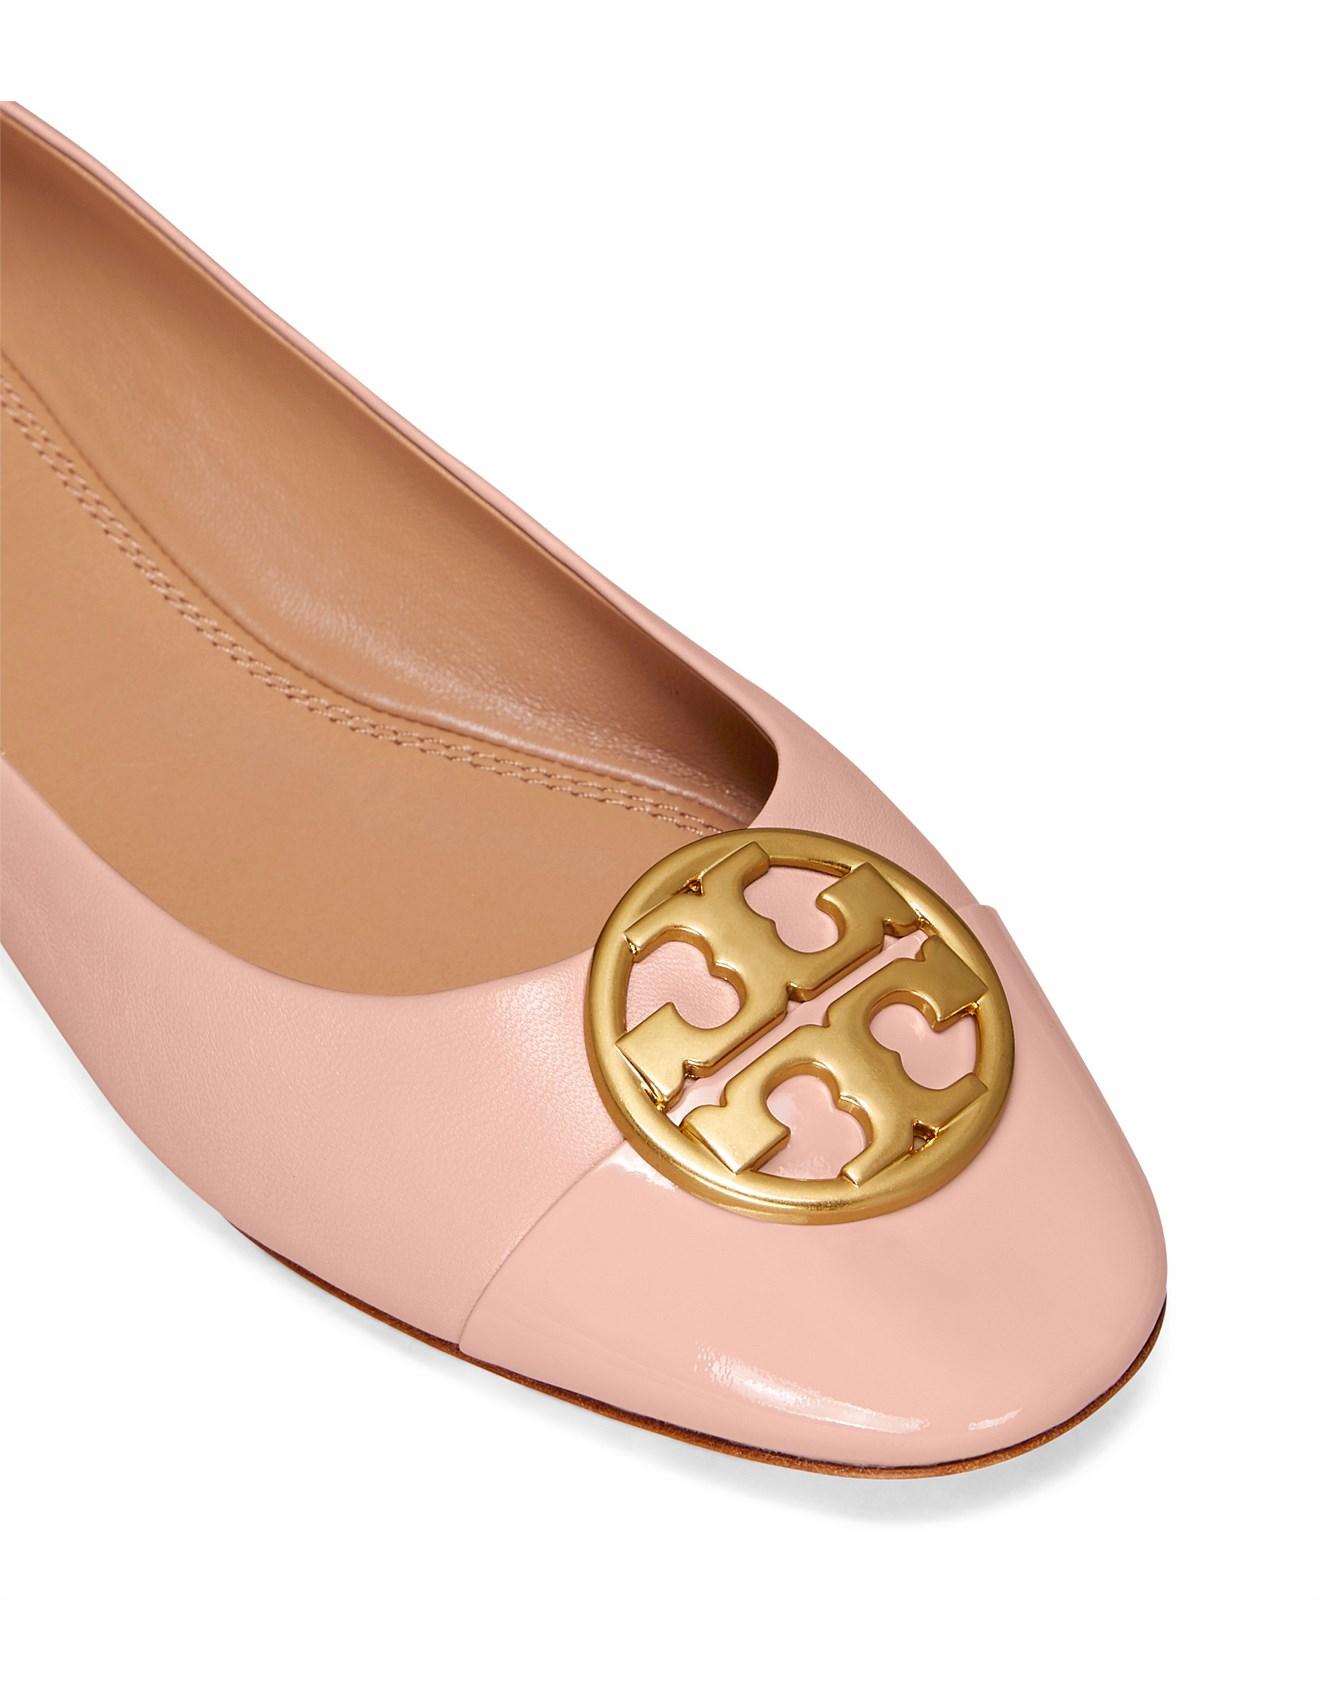 4b9db5211 Women s Flat Shoes